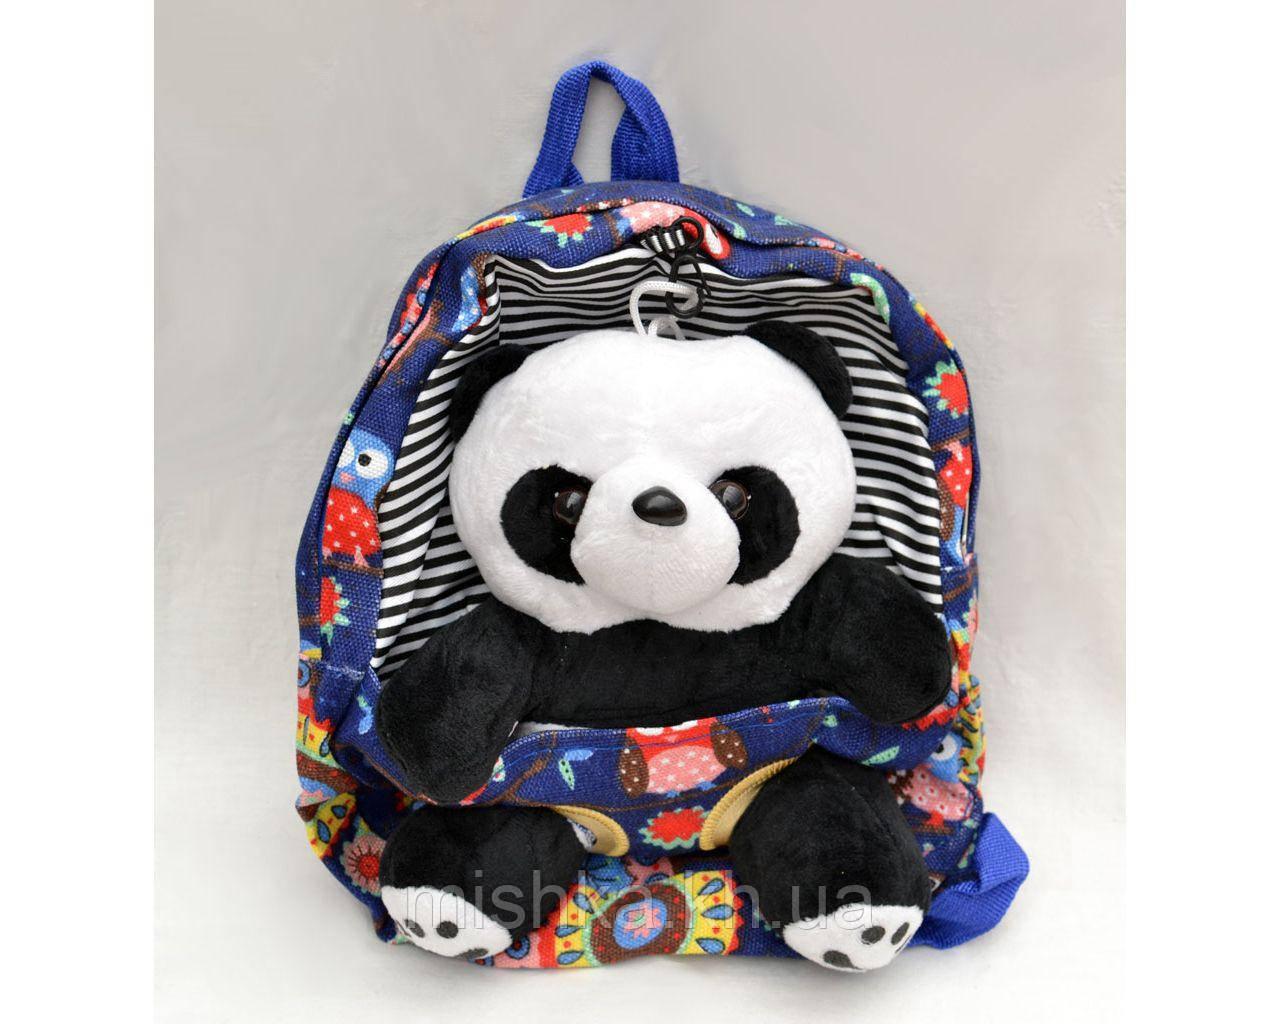 Рюкзак с мягкой игрушкой Панда